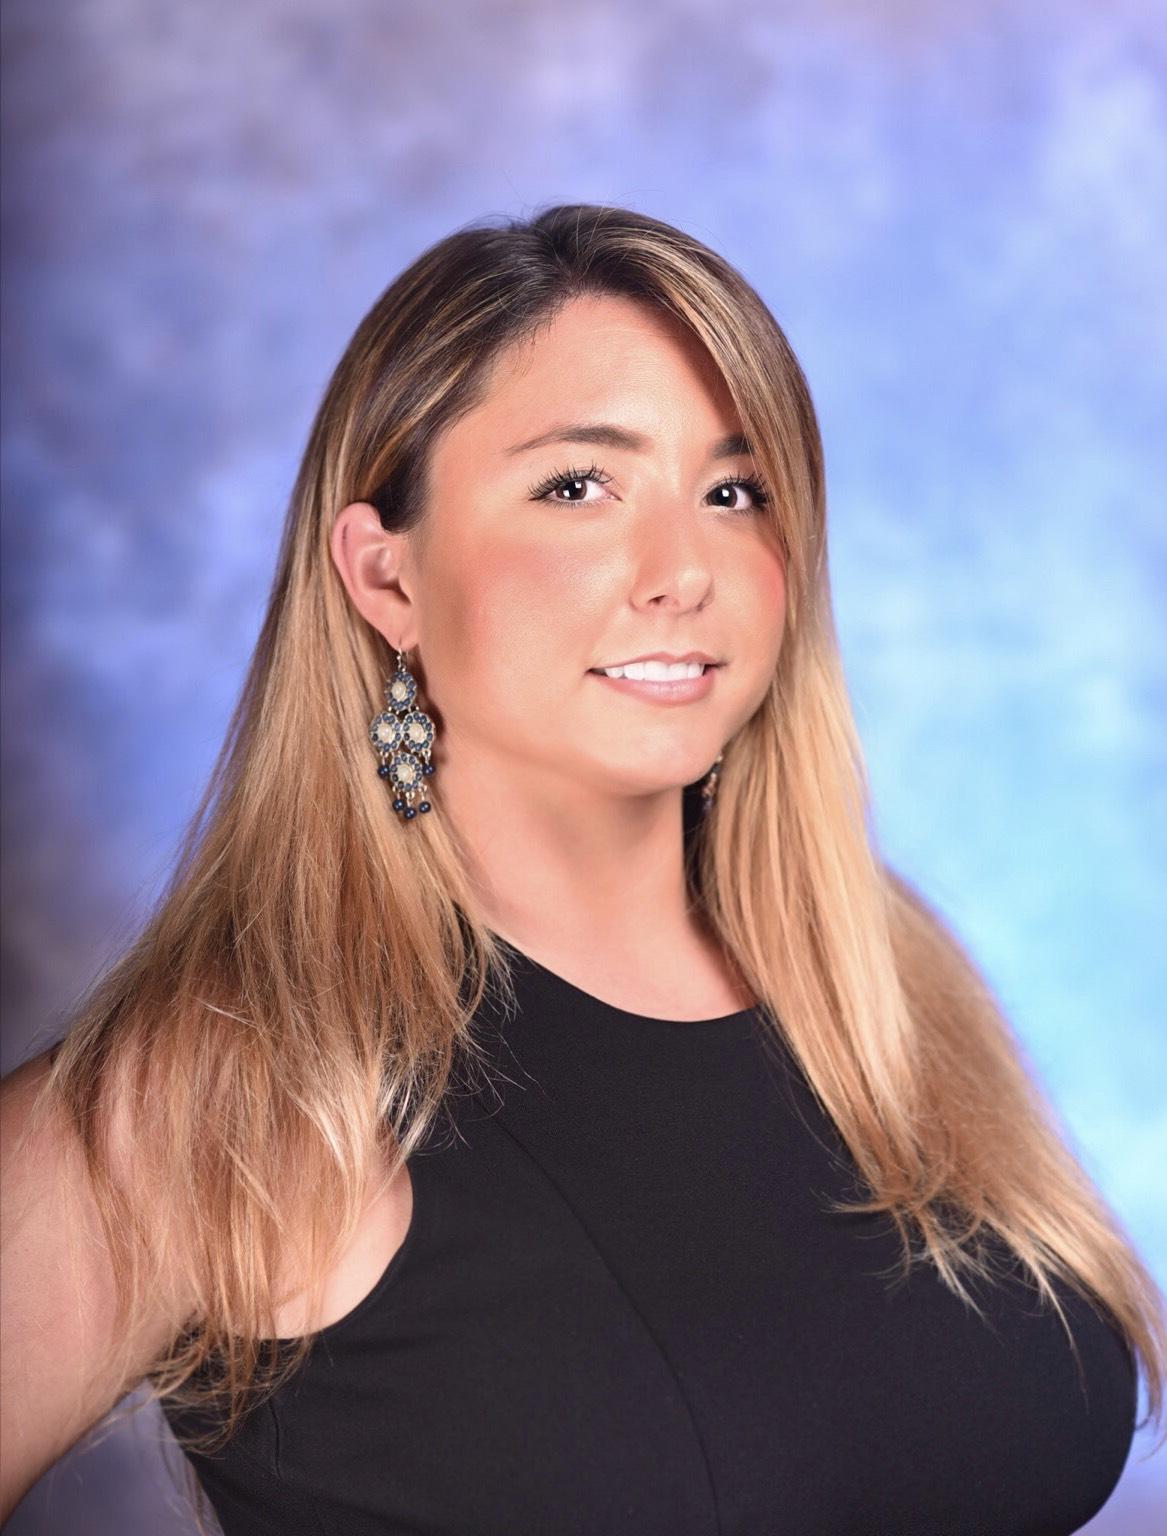 Carla Pecoraro - Associatecarla.pecoraro@marcusmillichap.com415.625.2143CA  License: 02019669